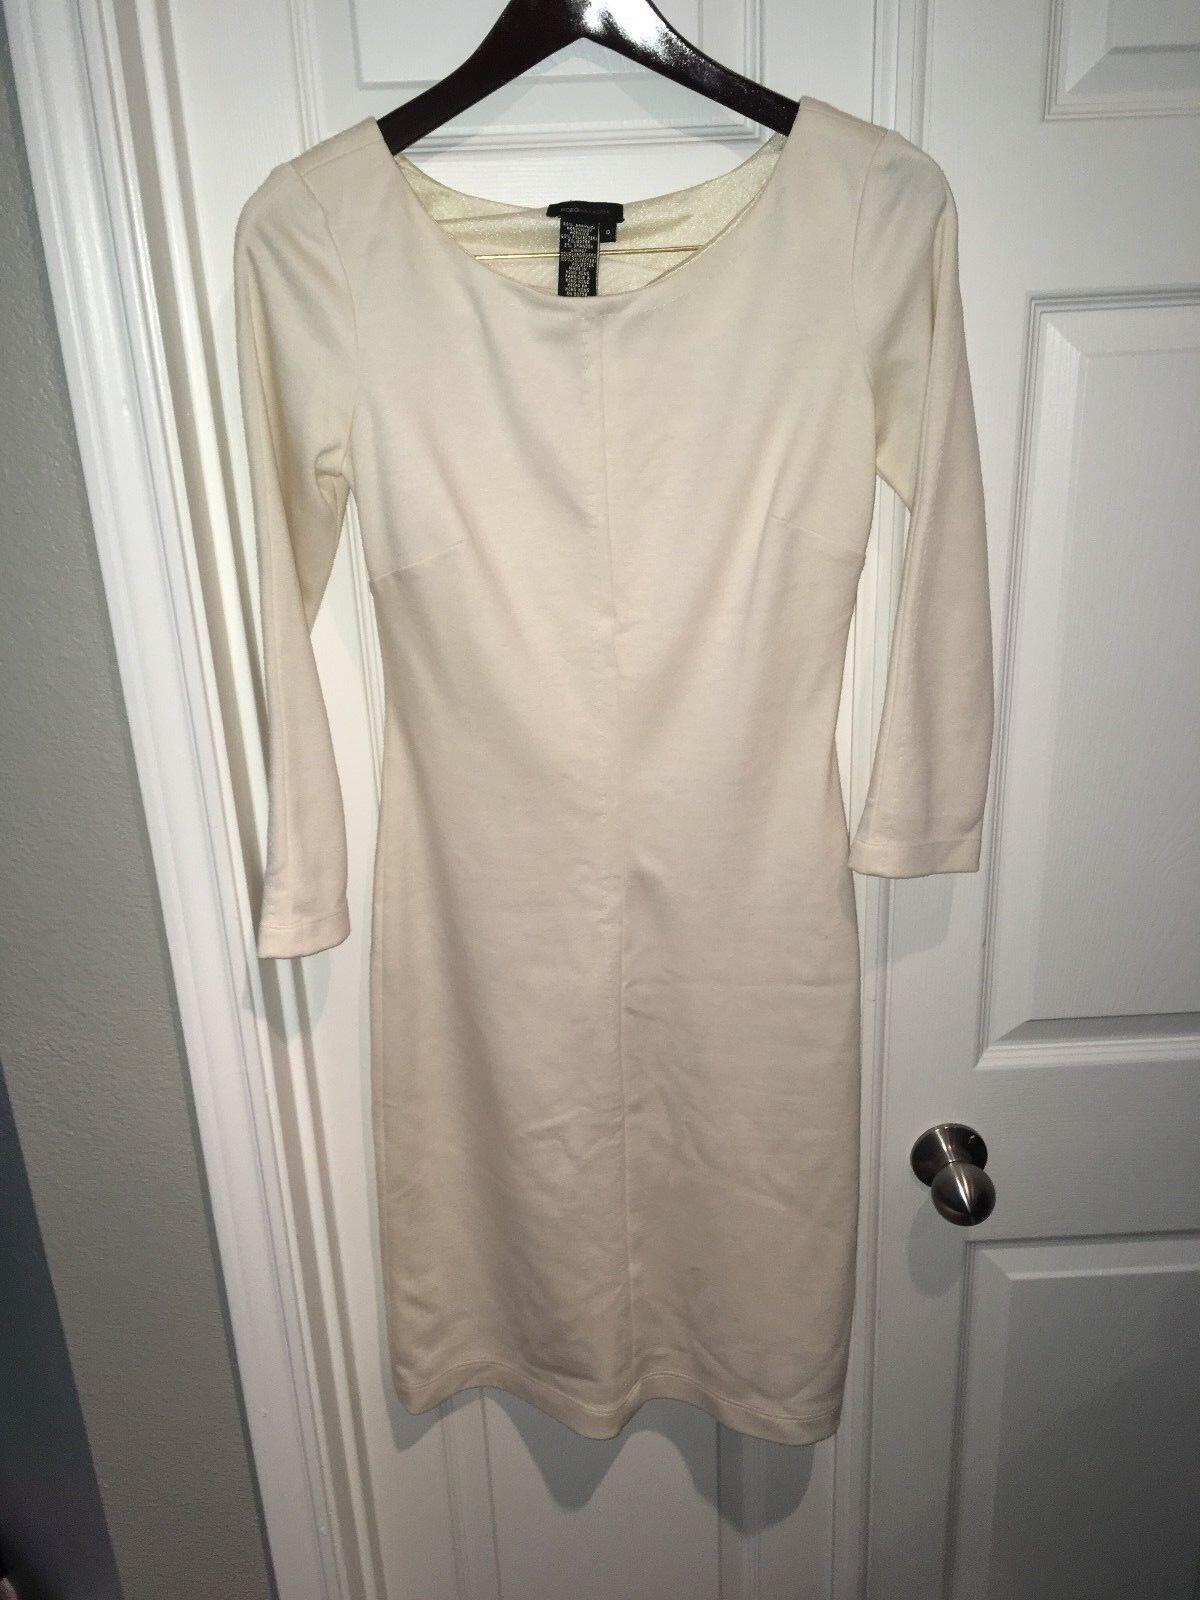 BCBG Maxazria Dress Größe 0 Weiß Cream Solid Sheath Long Sleeve Mid Calf Casual